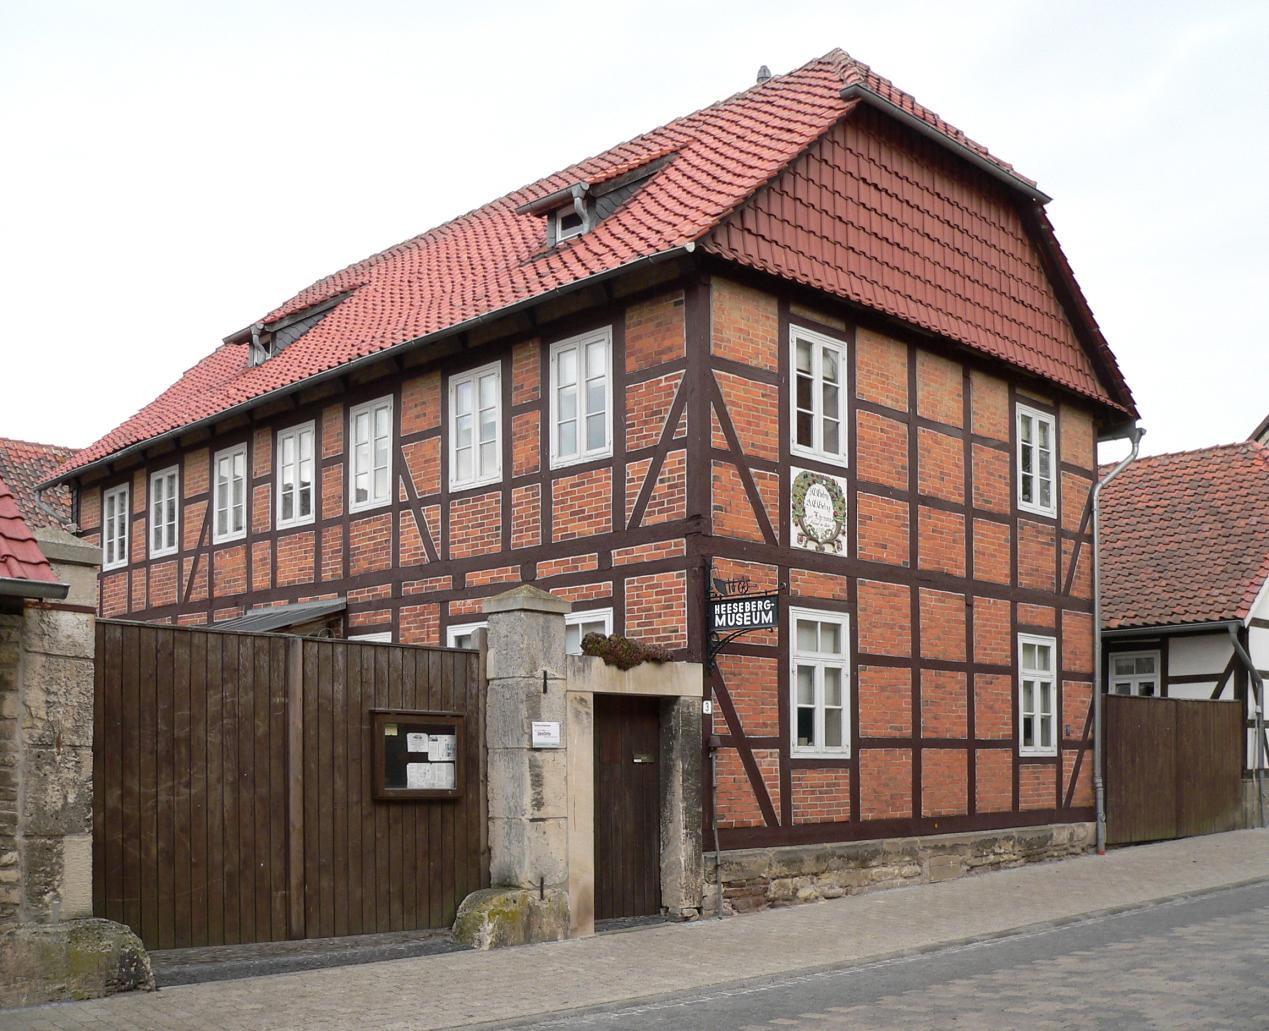 Watenstedt (Gevensleben)